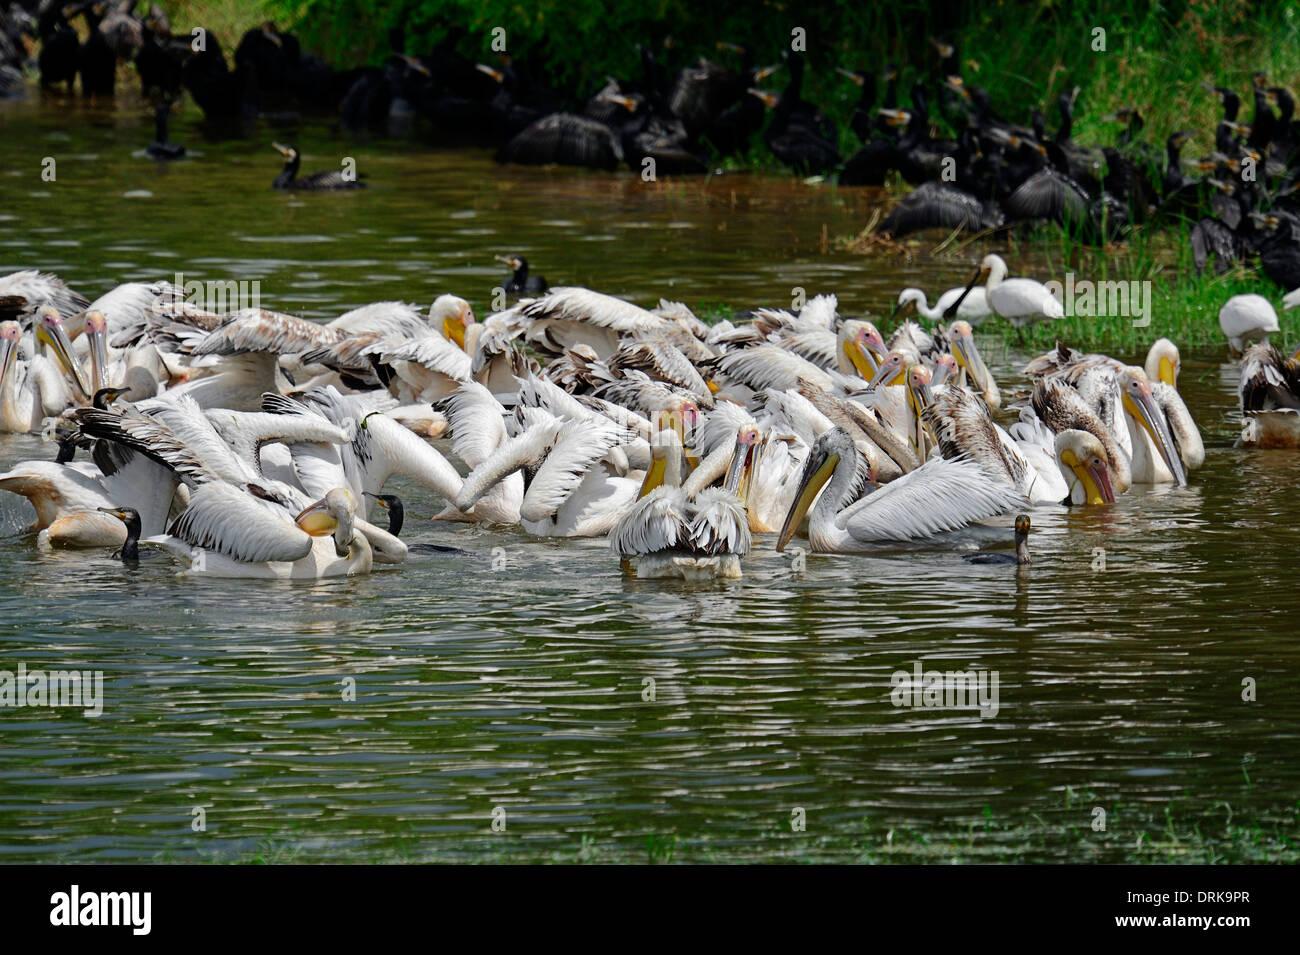 Great Cormorant, (Phalacrocorax carbo) Dalmatien Pelican, (Pelecanus crispus) and White Pelican (Pelecanus onocrotalus) - Stock Image